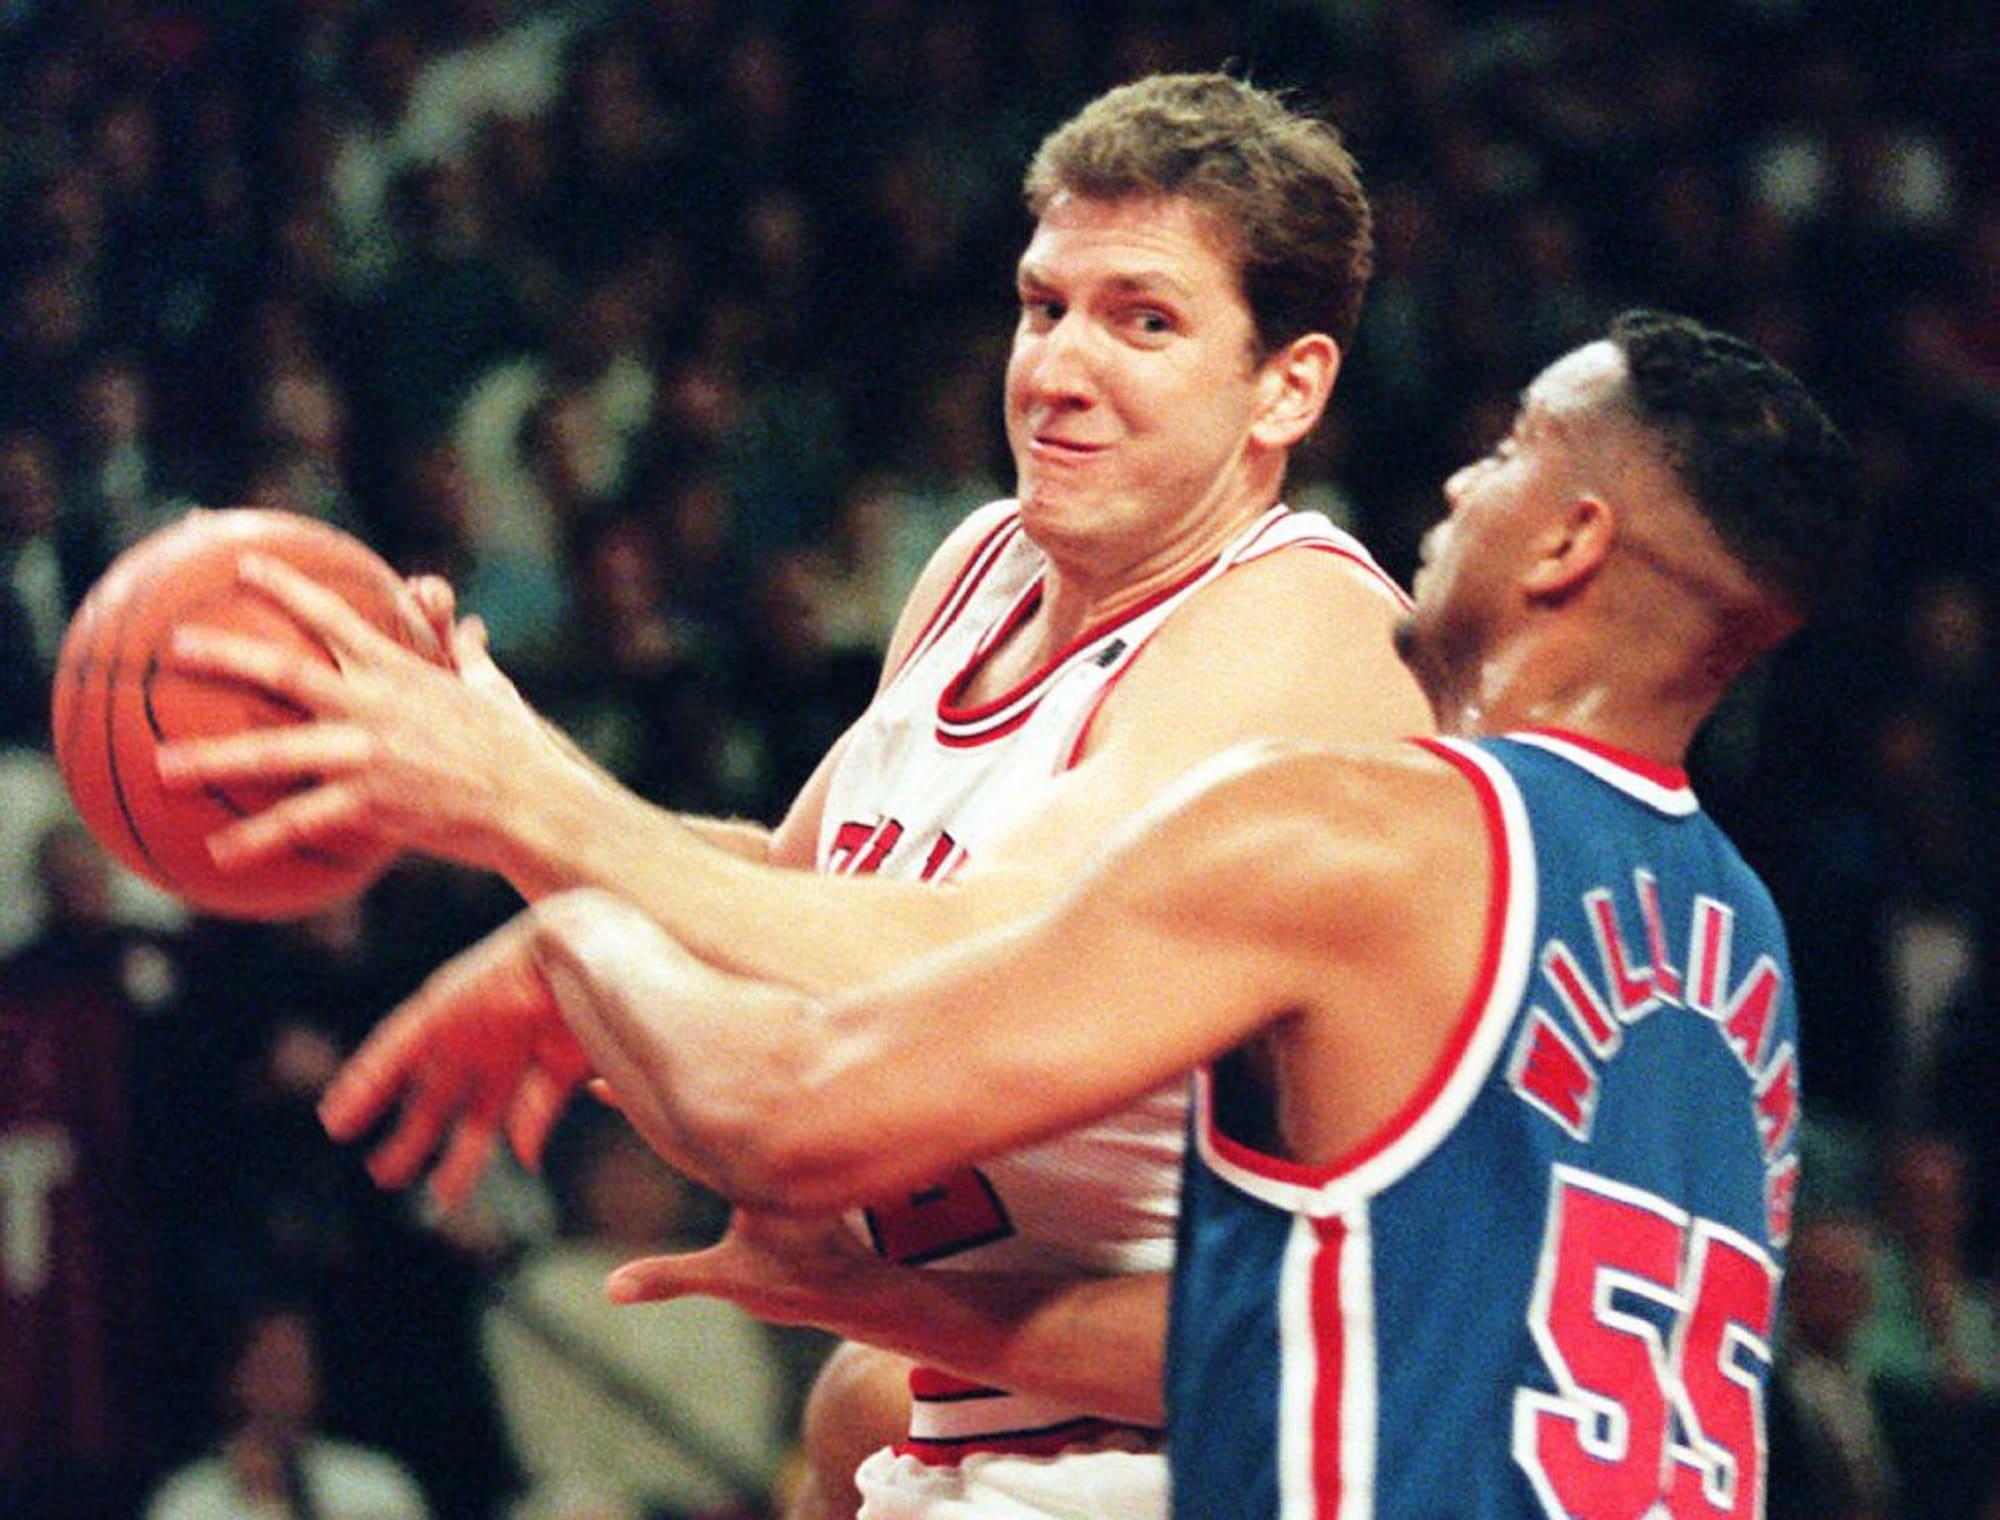 Michael Jordan on Chicago Bulls